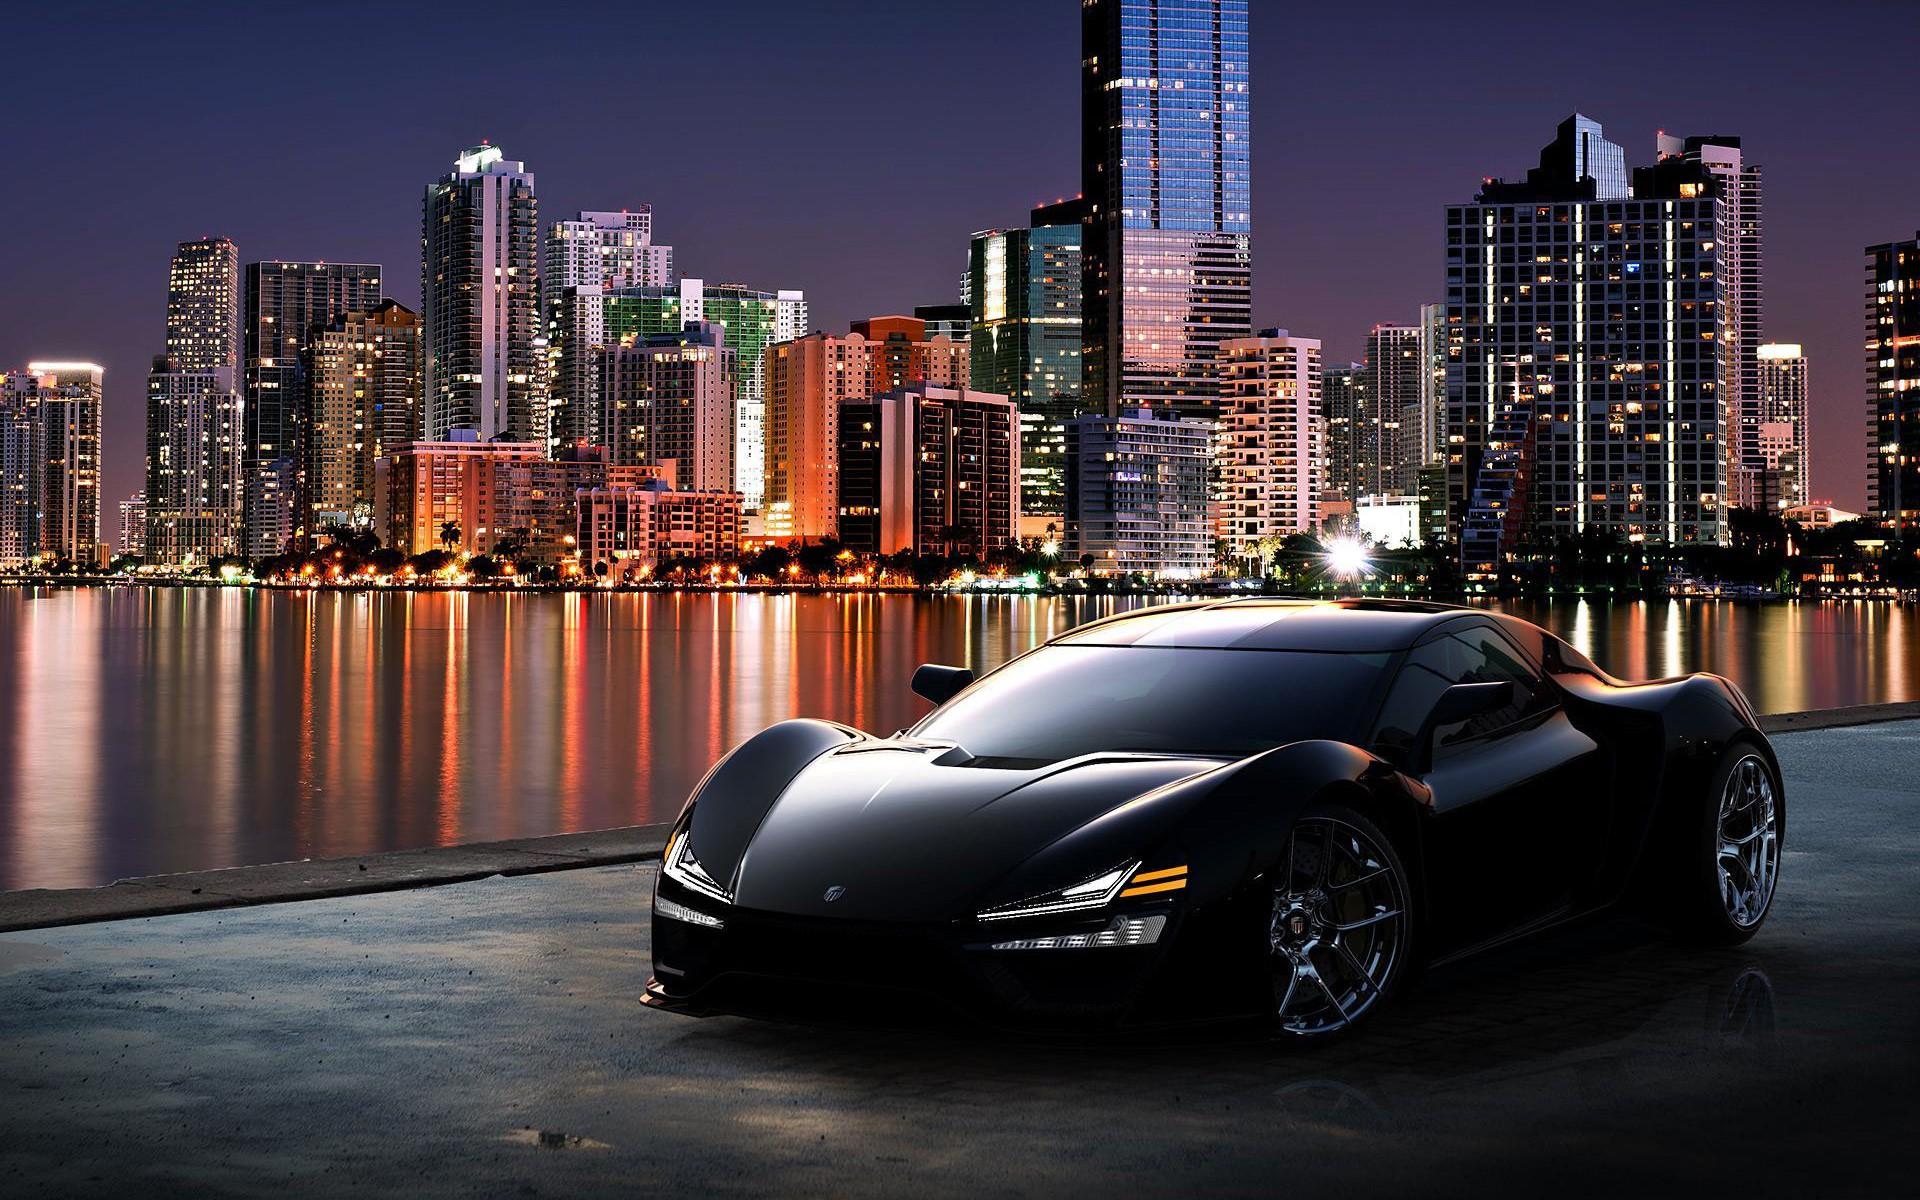 Background Car Hd Wallpapers Cities: 2016 Trion Nemesis RR Wallpaper